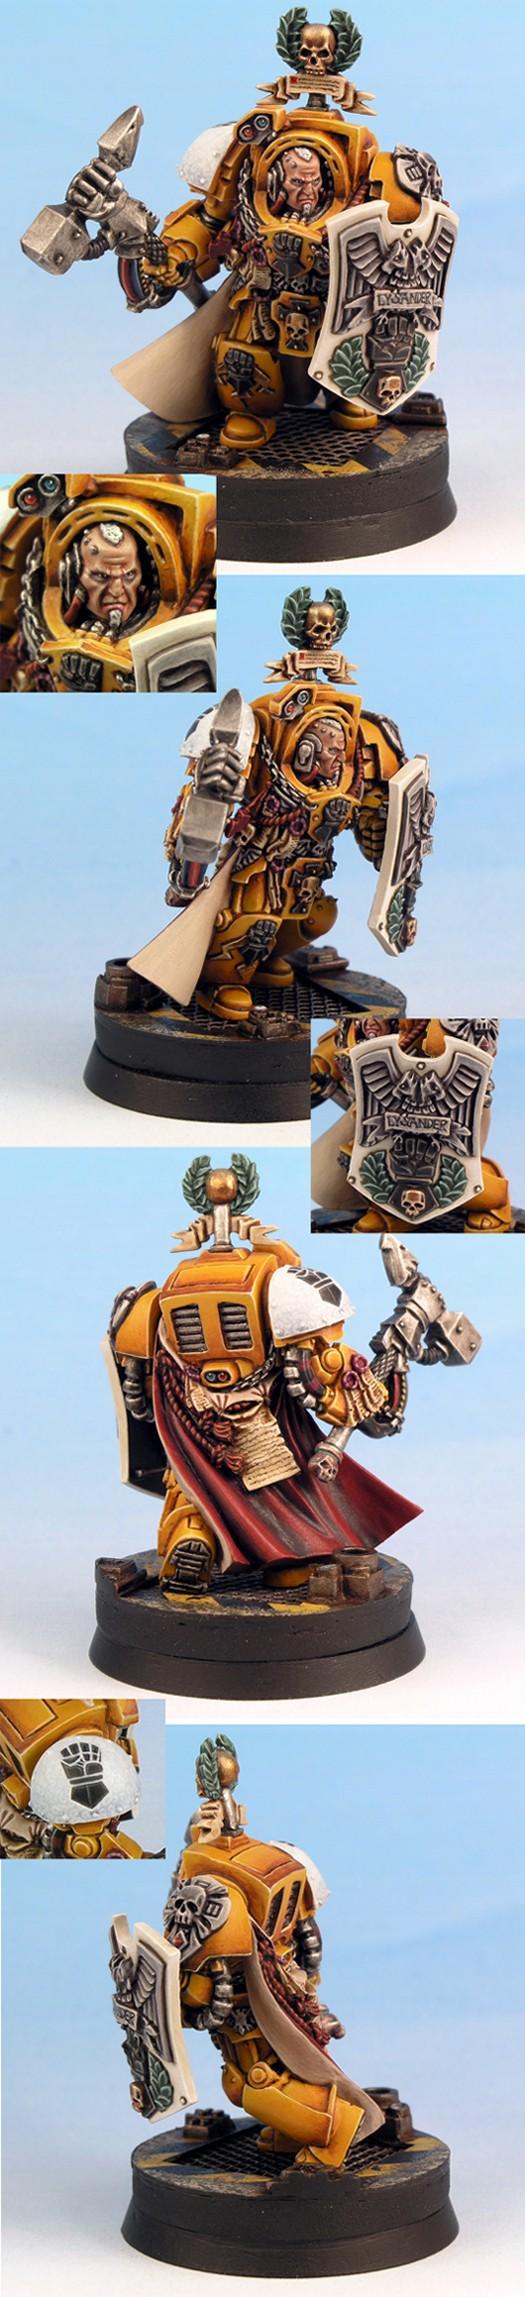 Imperial Fist Captain Lysander